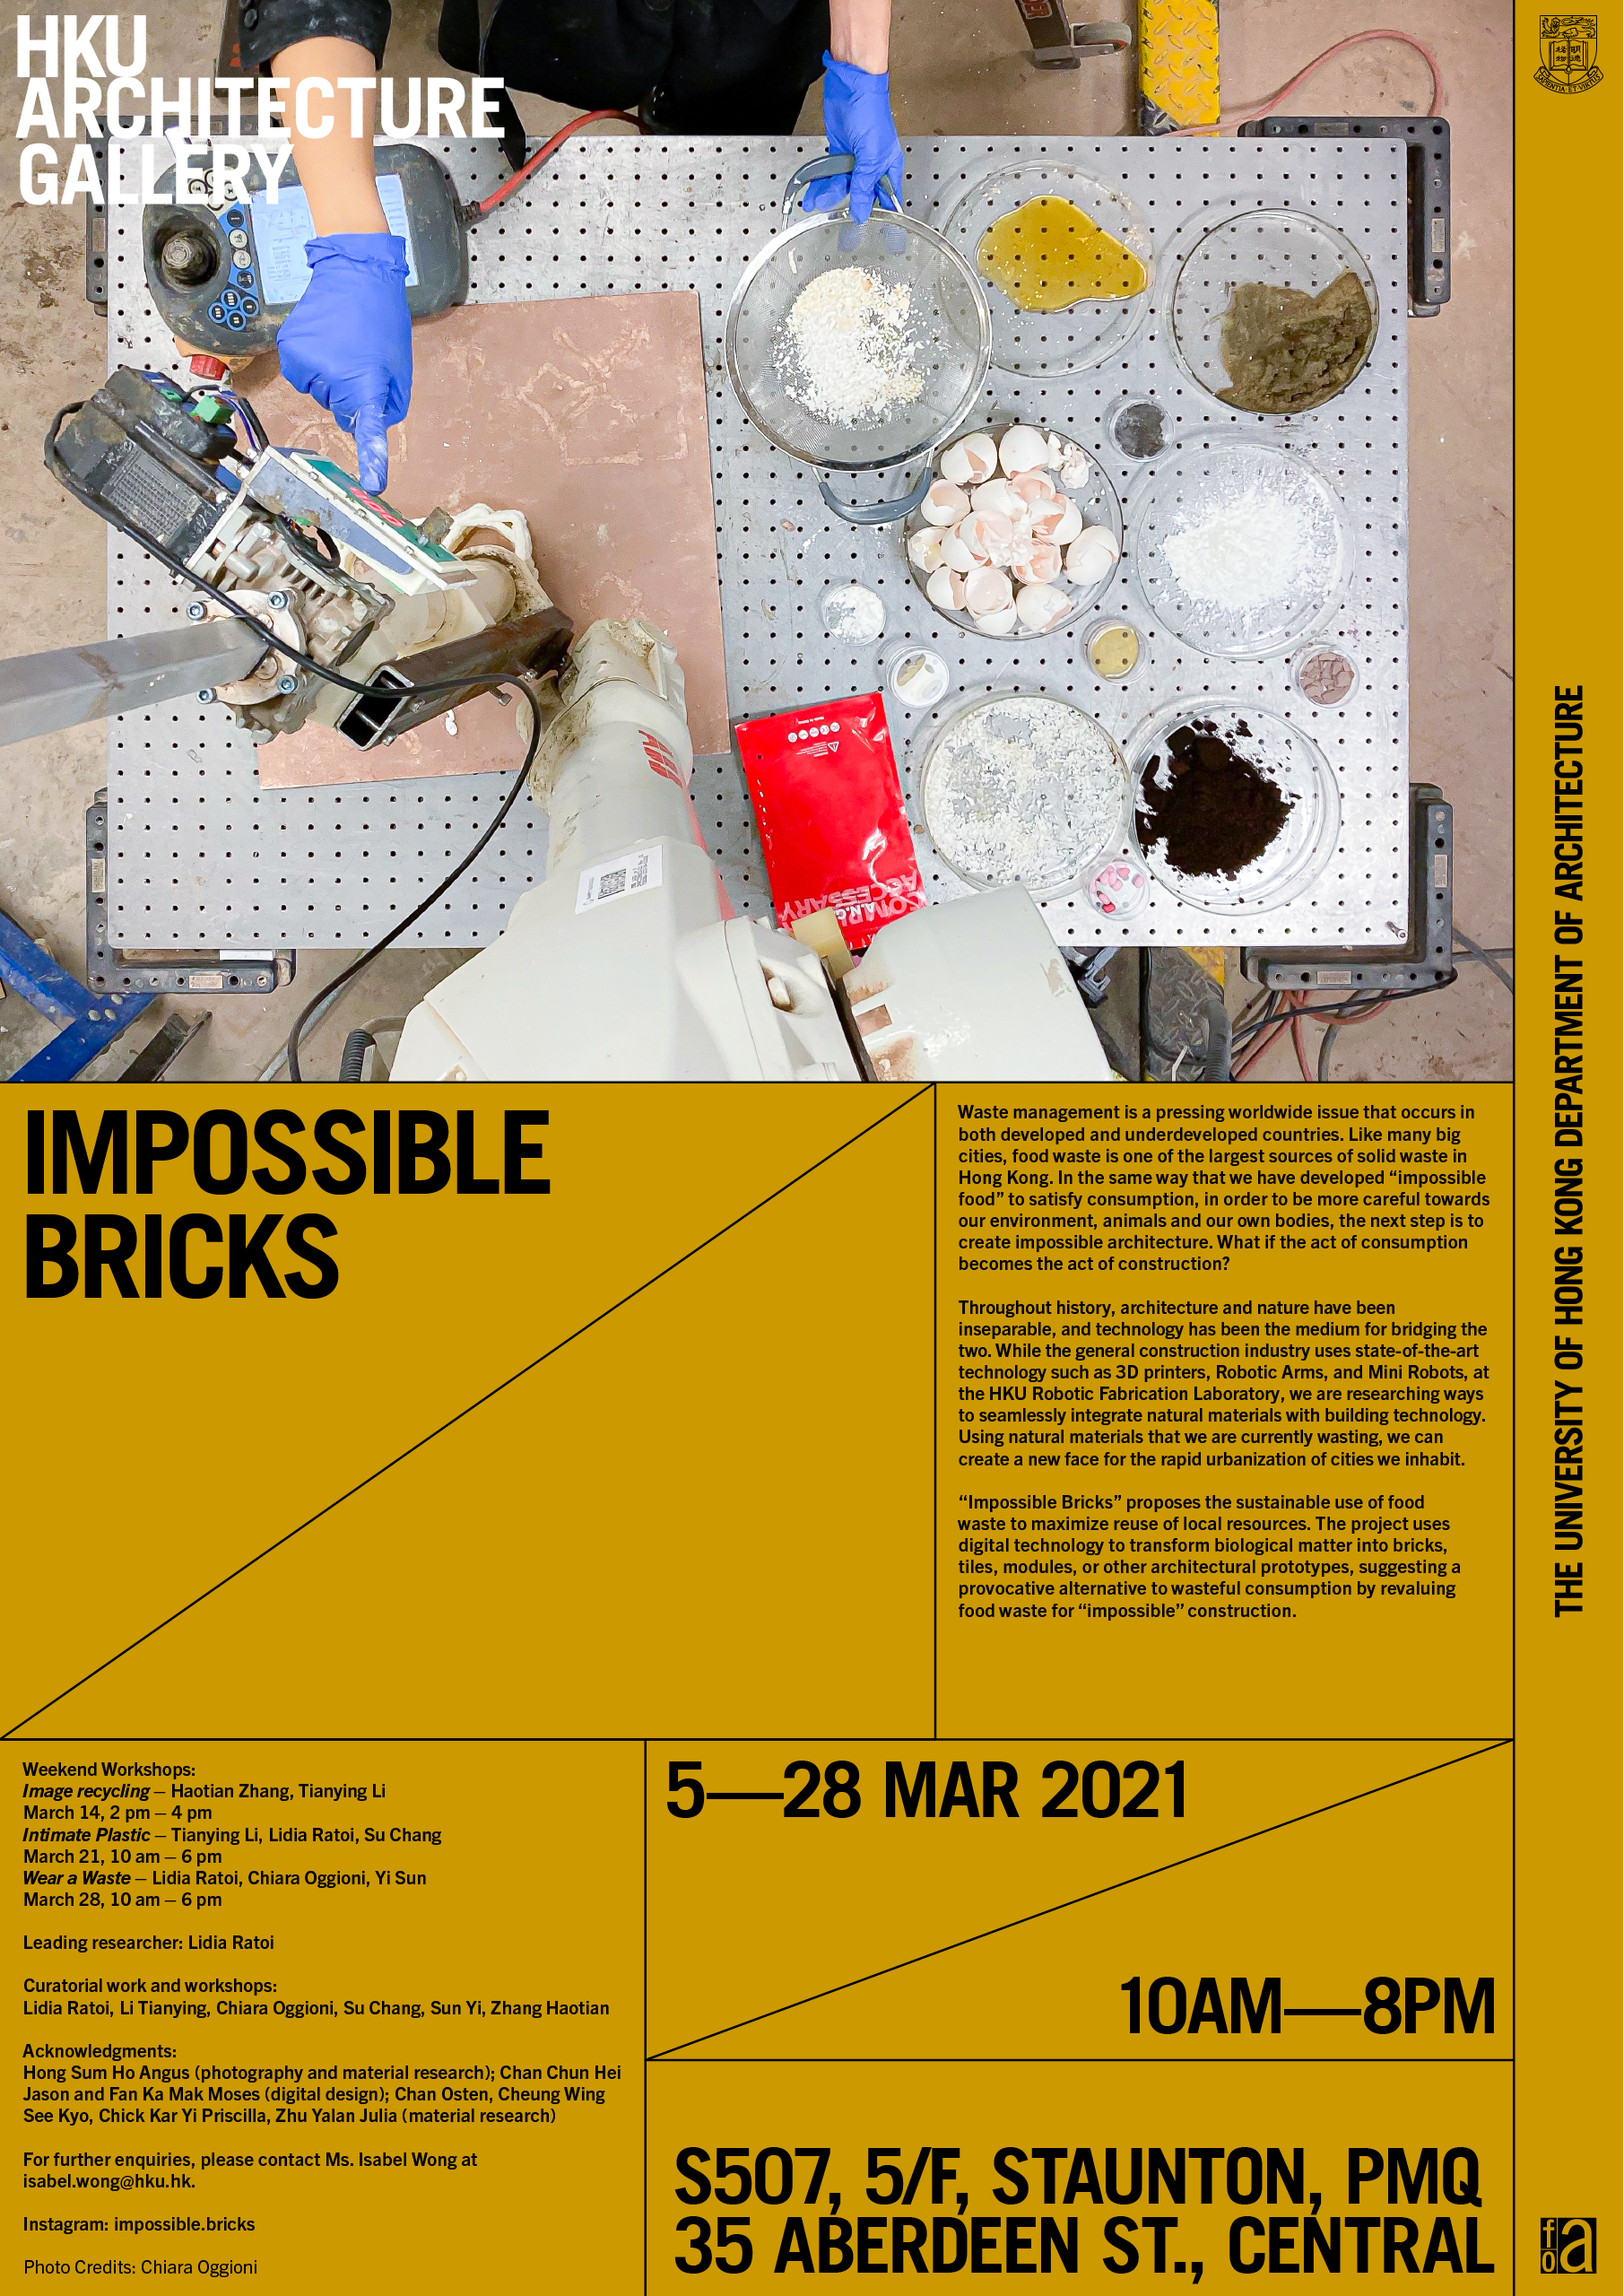 """Impossible Bricks"" Exhibition @ PMQ"